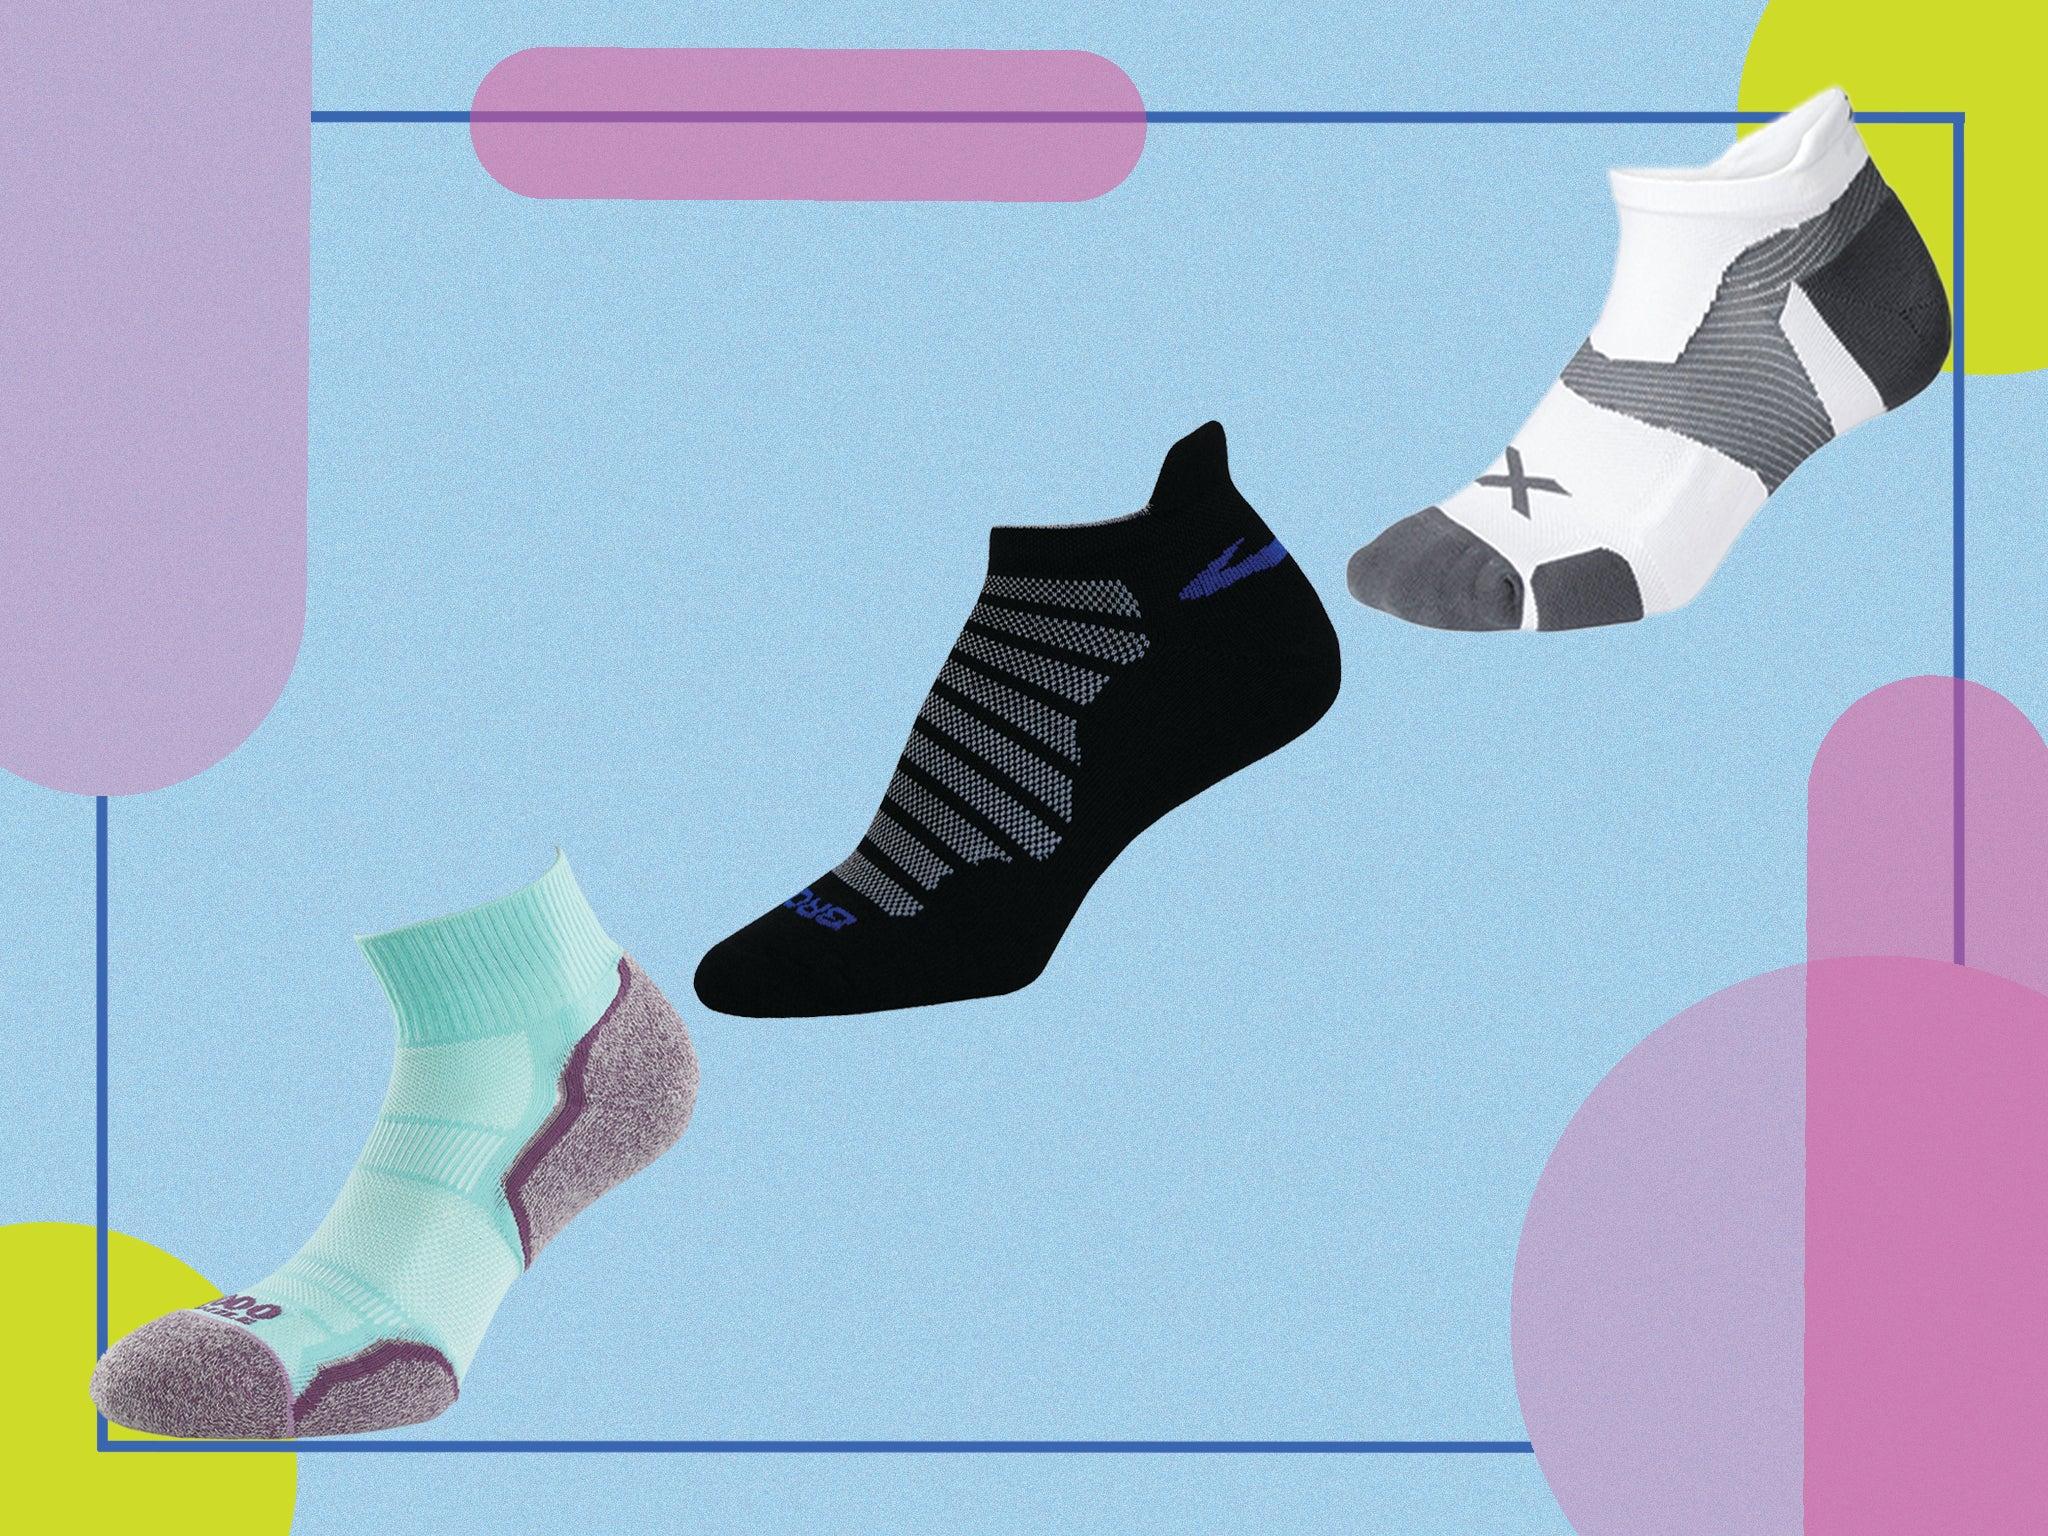 Best running socks 2020: Compression